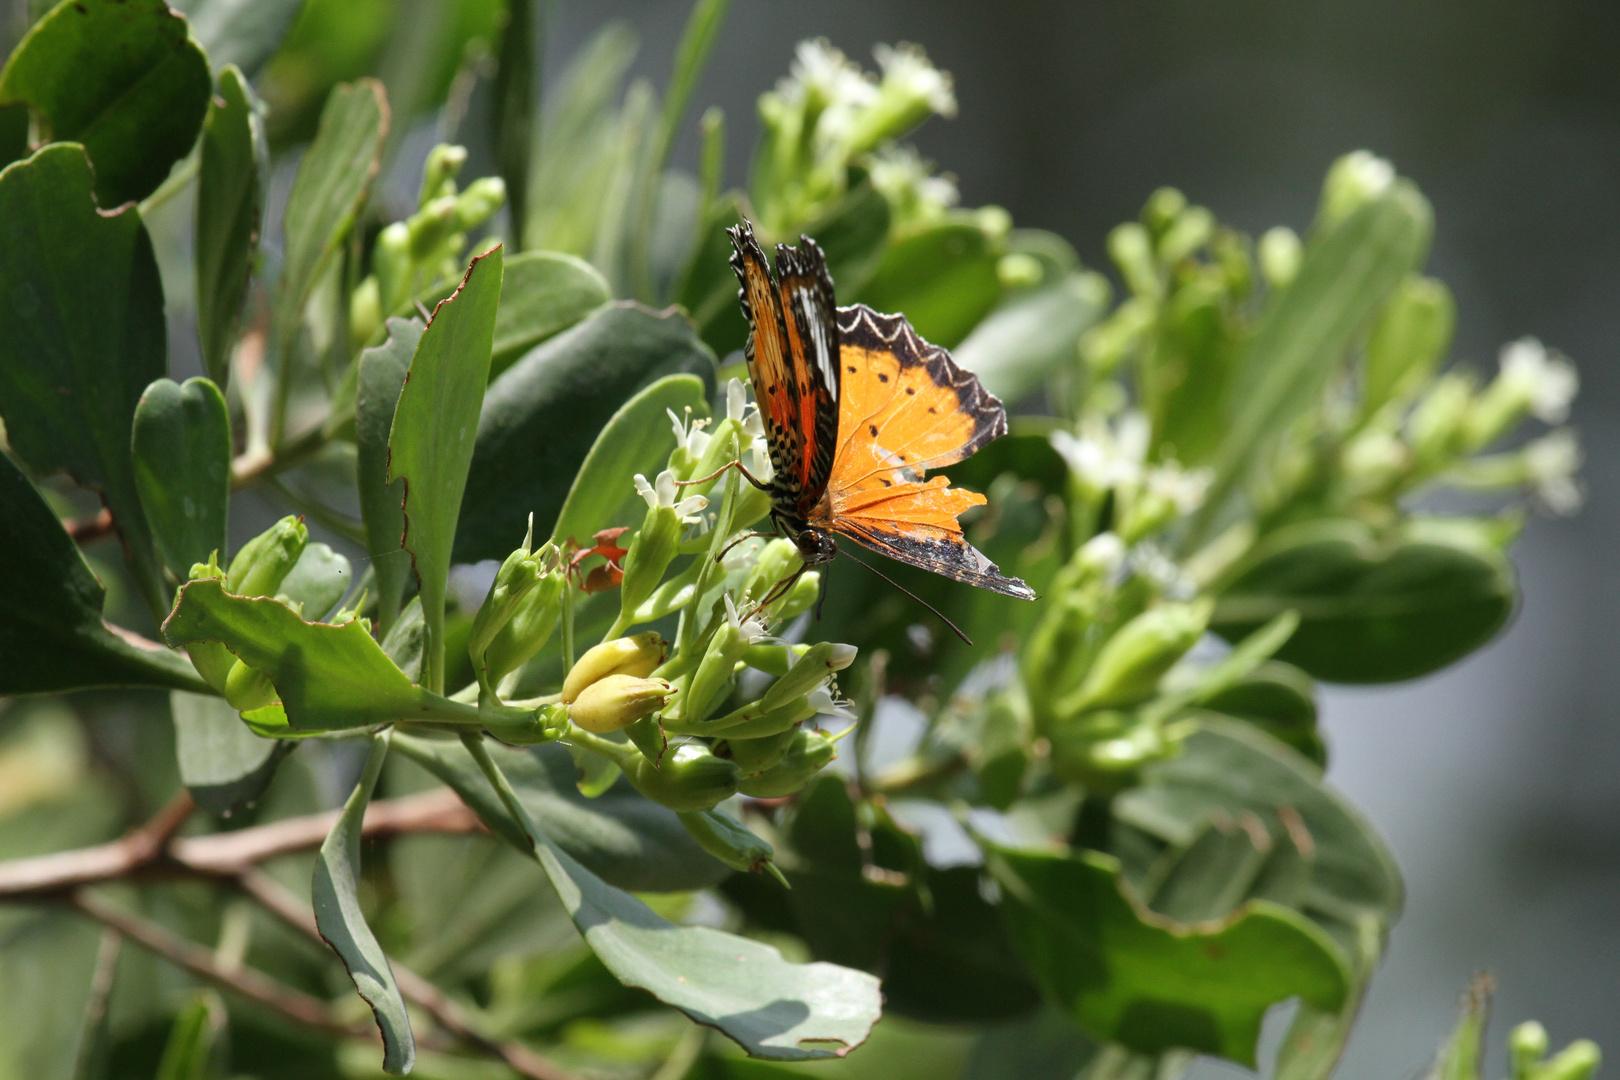 Butterfly in senior days